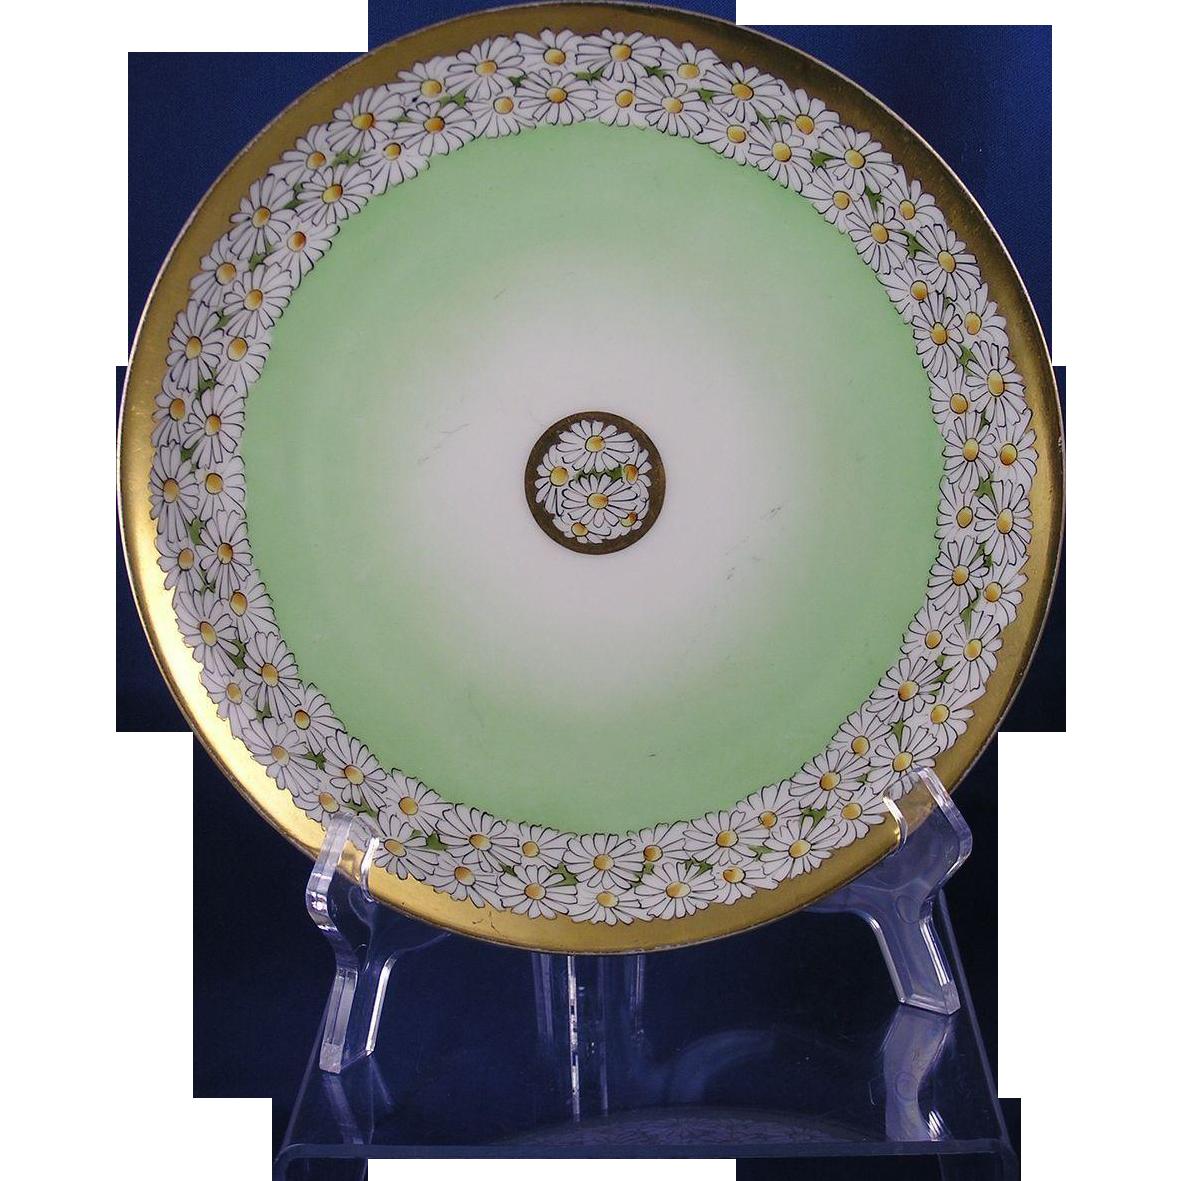 Haviland Limoges Stouffer Studios Daisy Motif Plate (c.1906-1914)